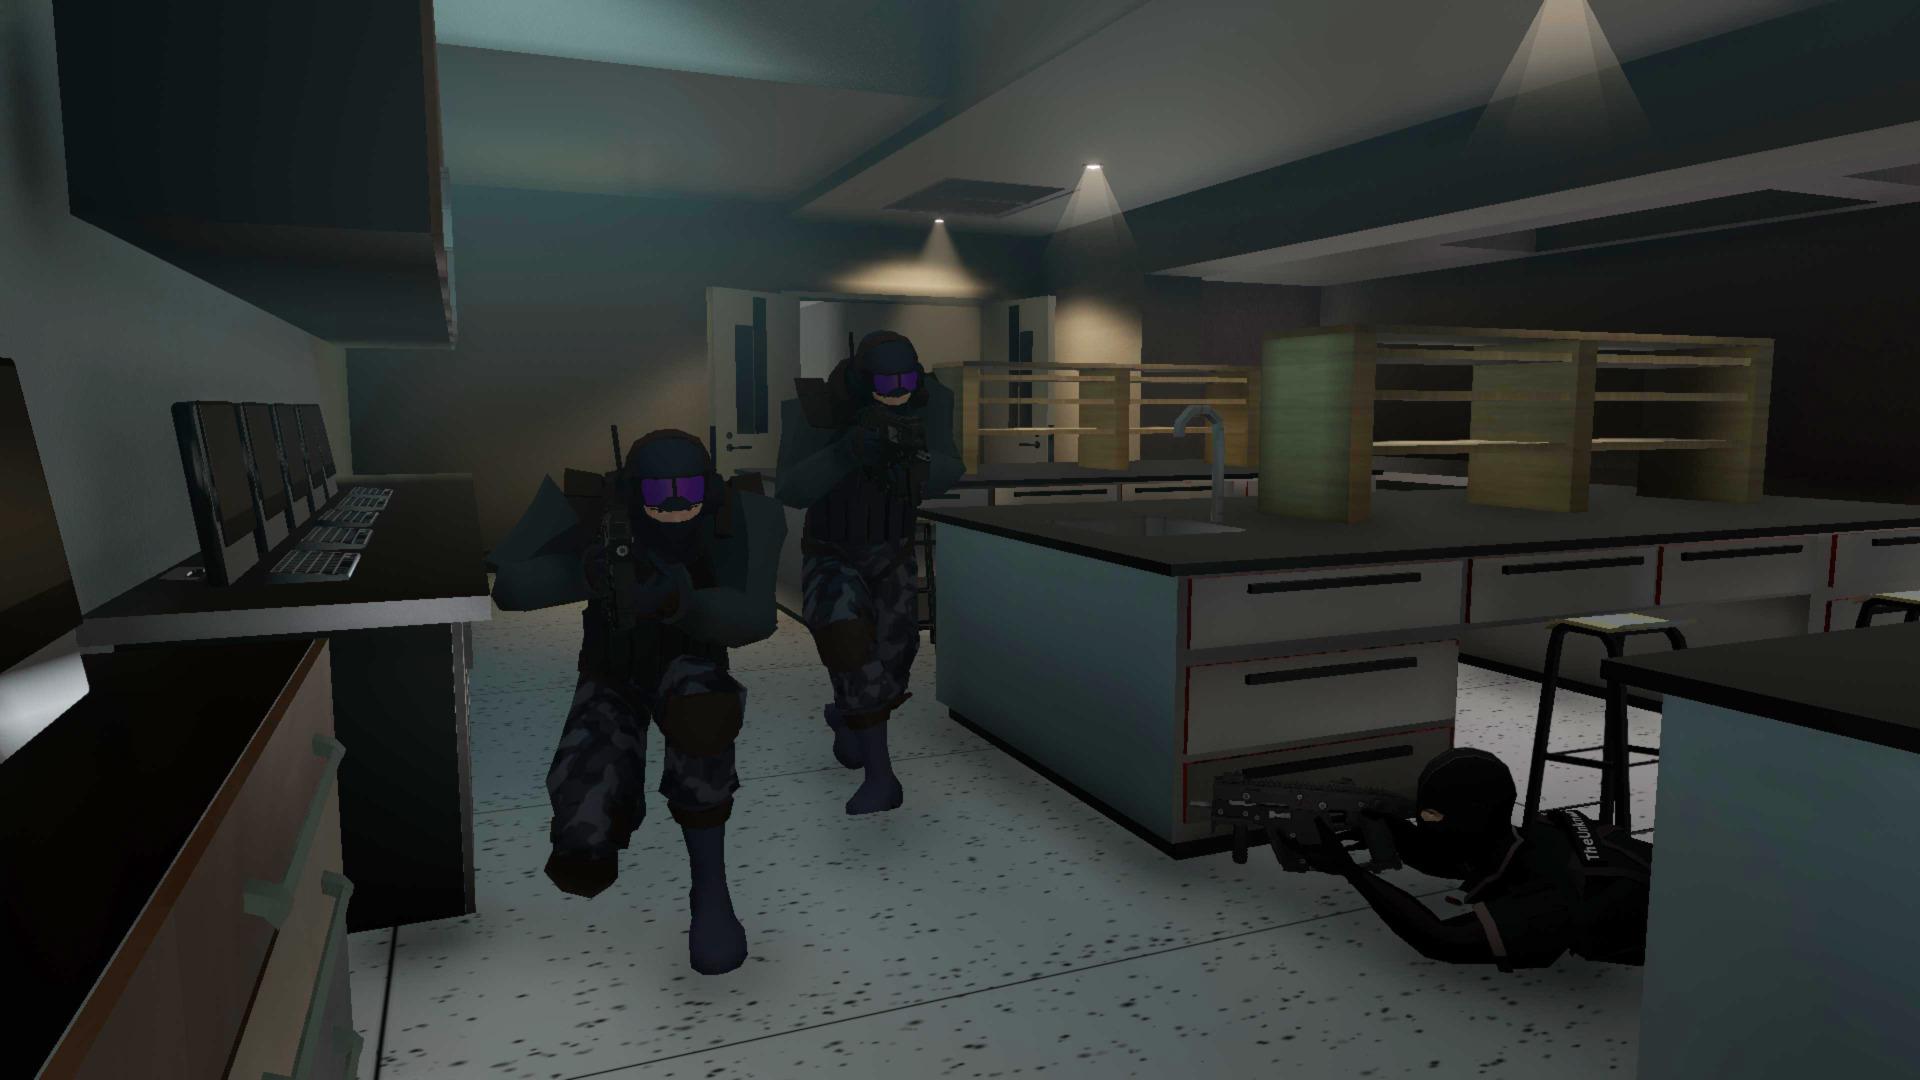 Intruder by Superboss Games